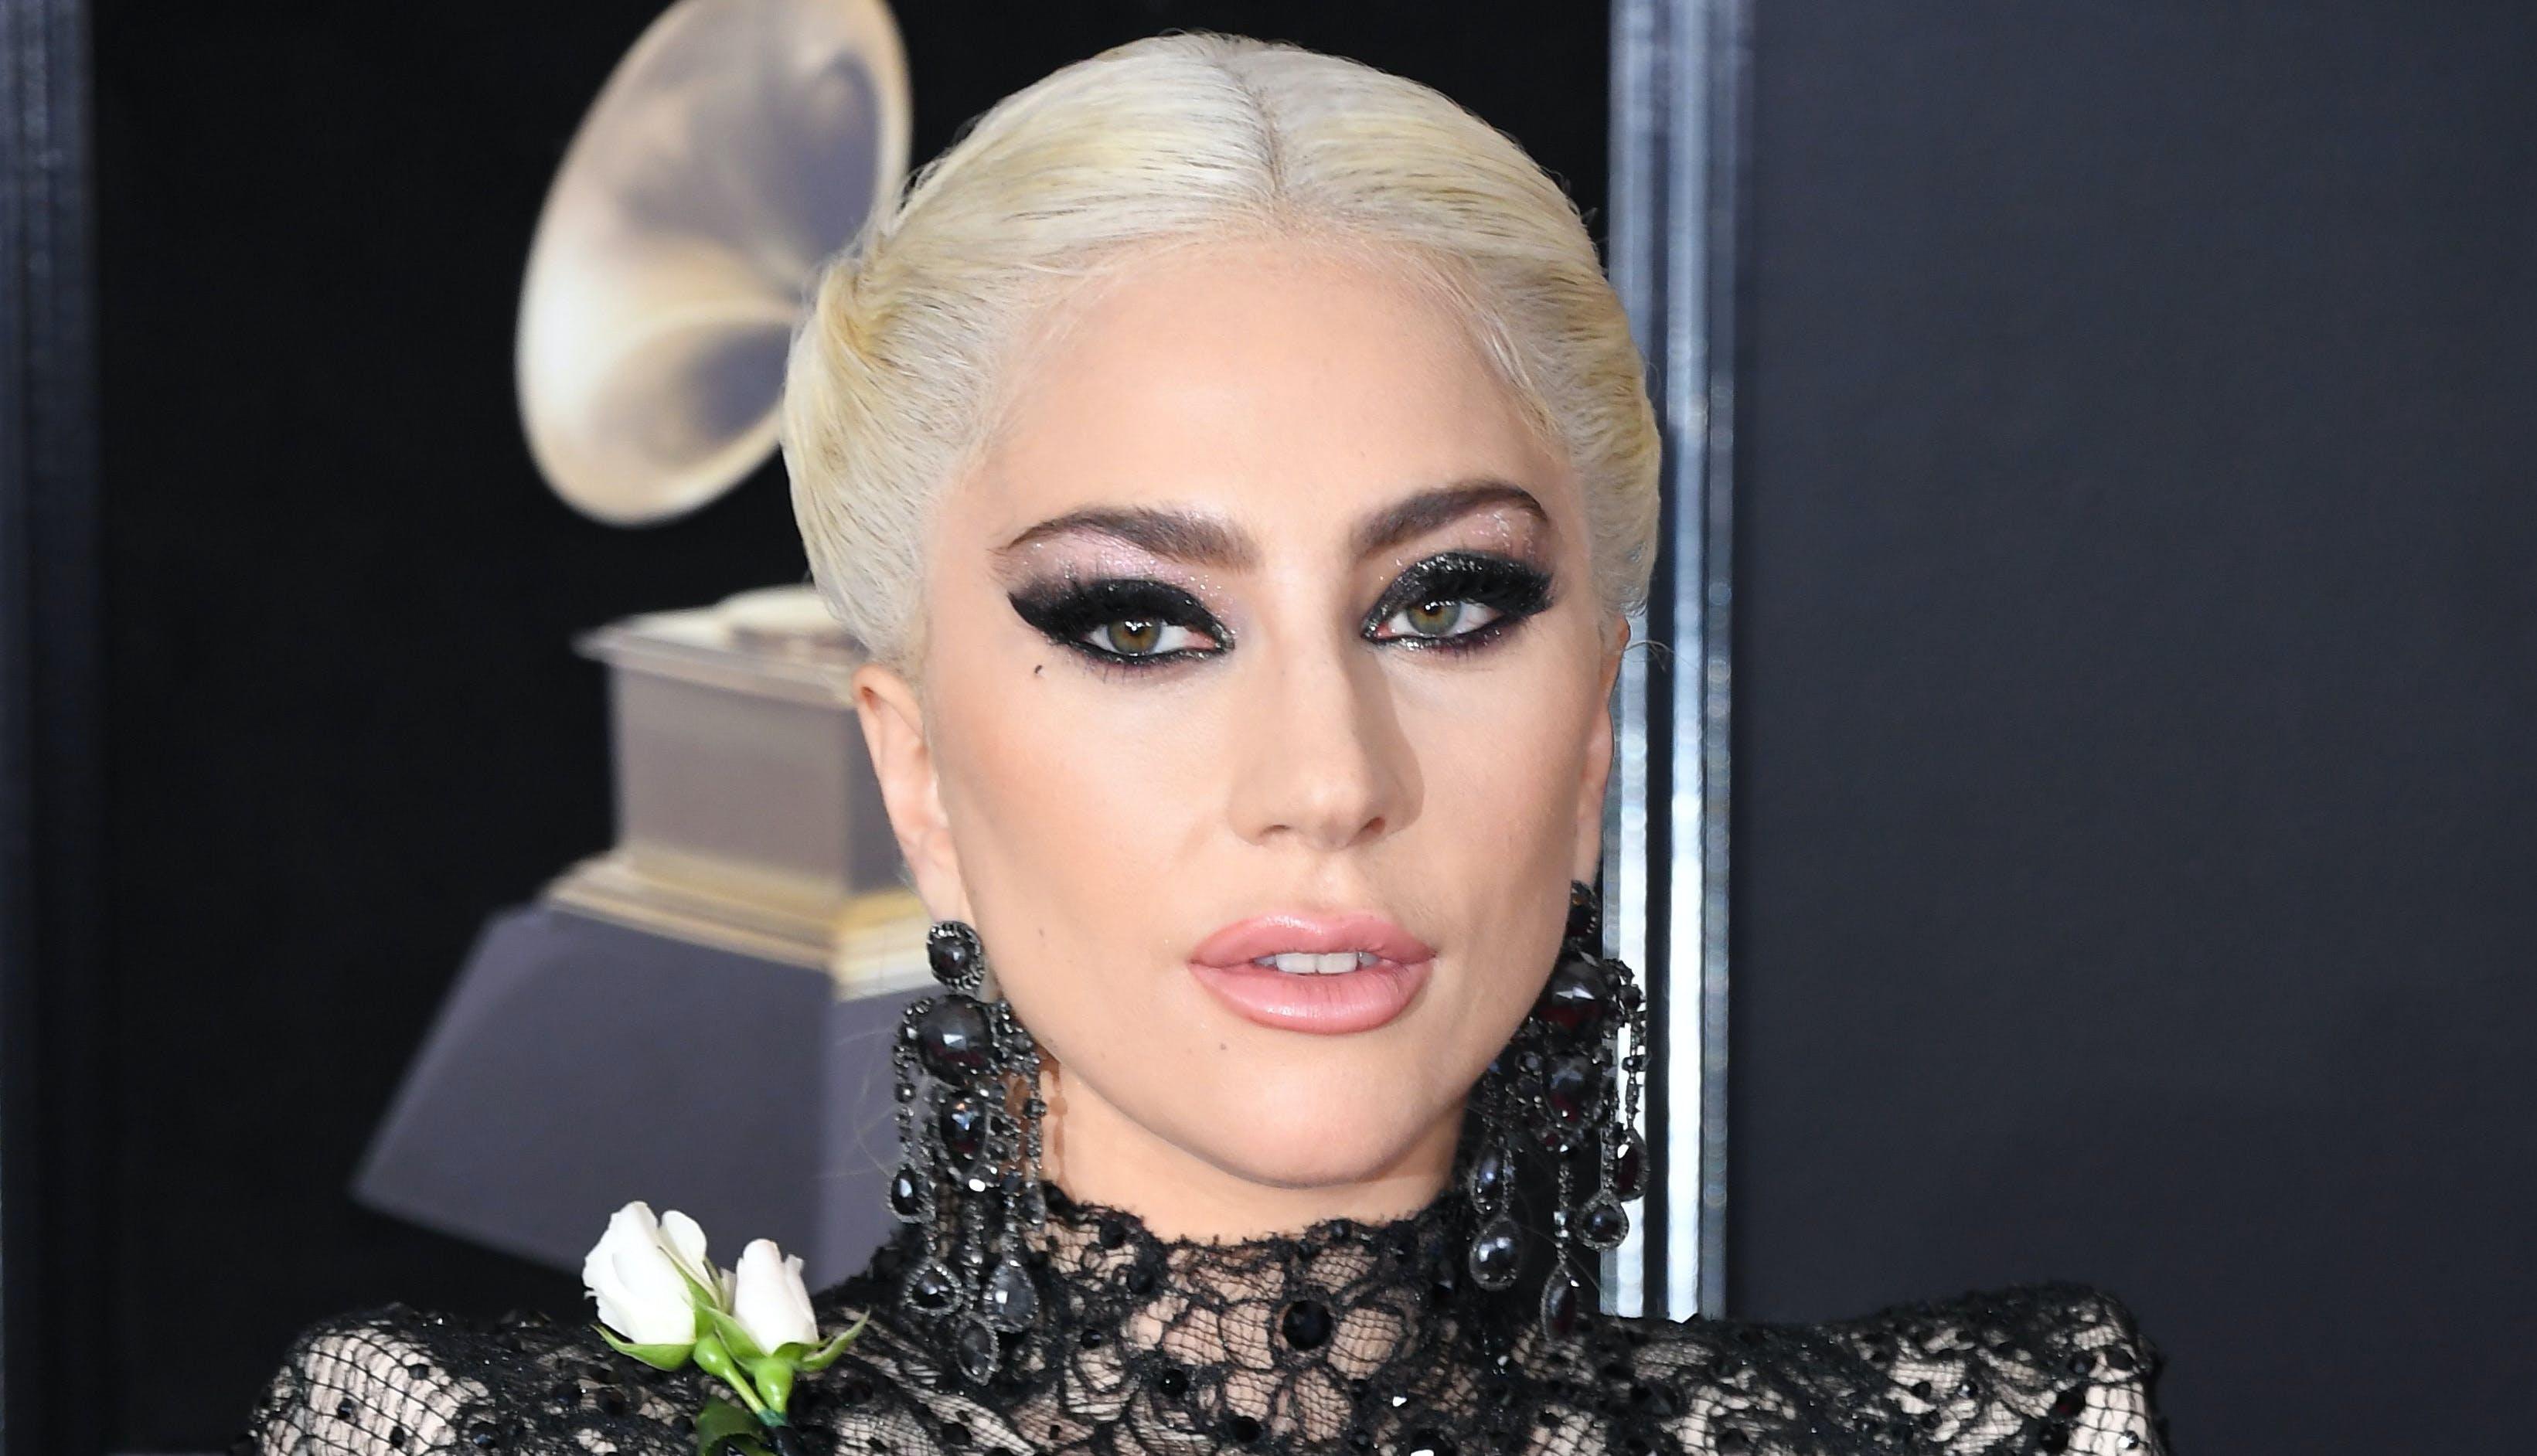 Lady Gaga Grammy awards red carpet look 2